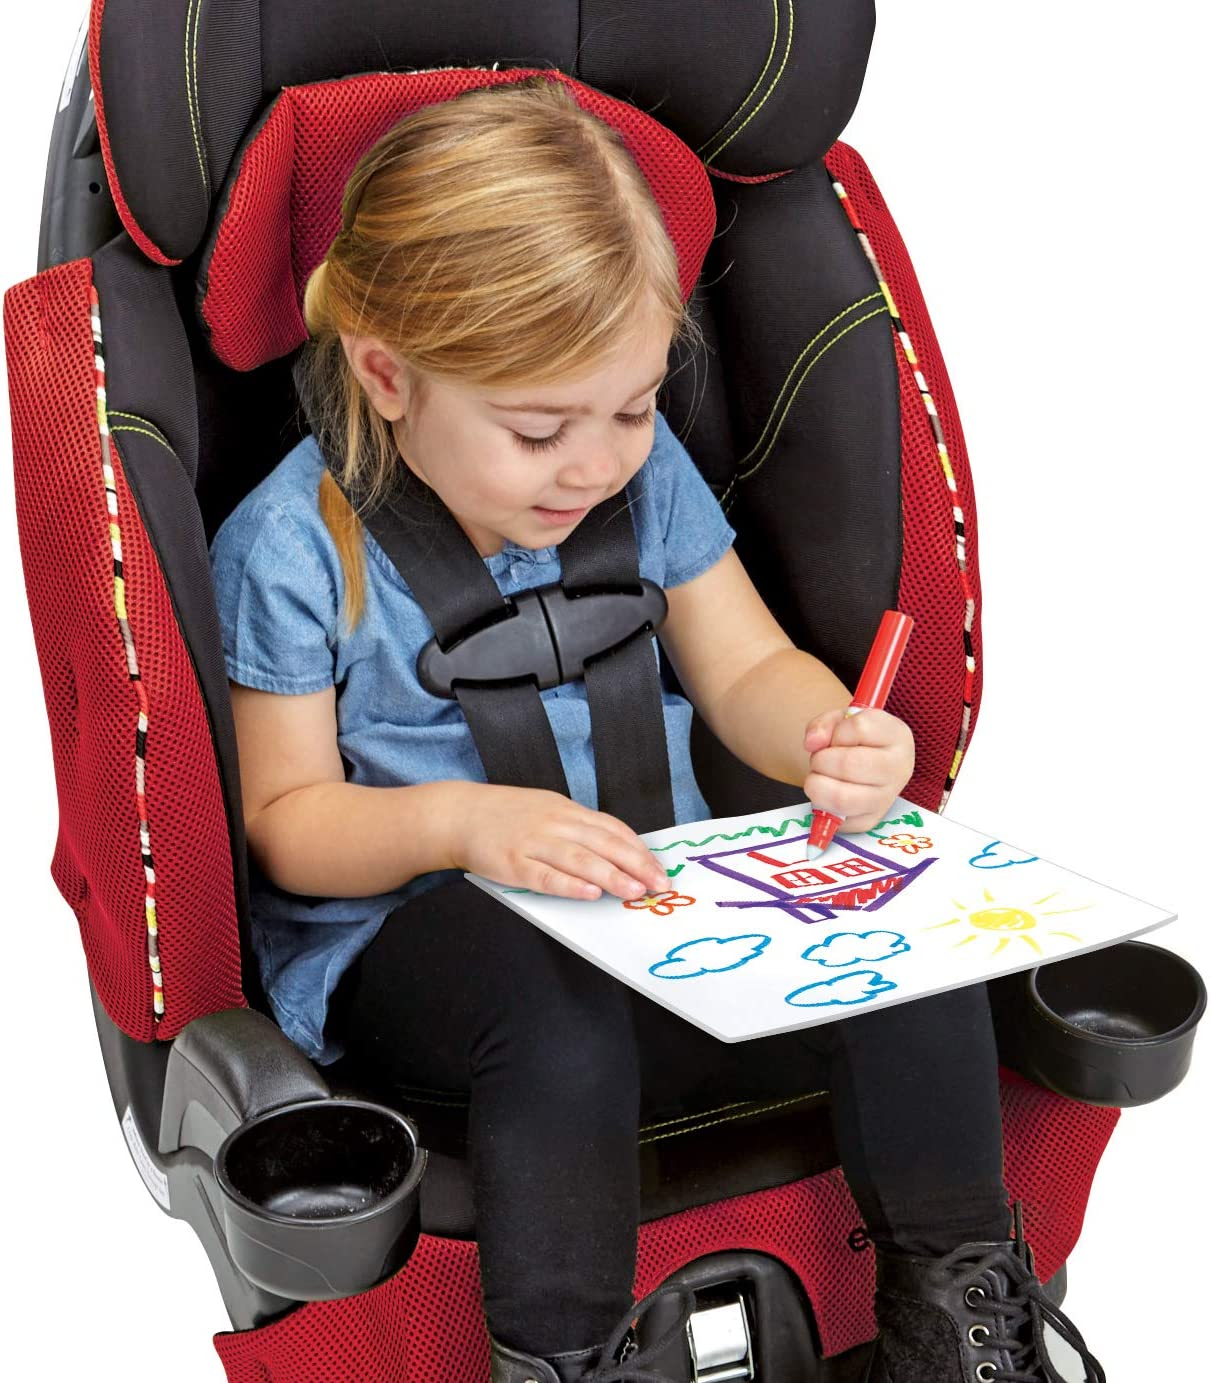 Toys & Games Coloring Pens & Markers ghdonat.com Kids Indoor ...